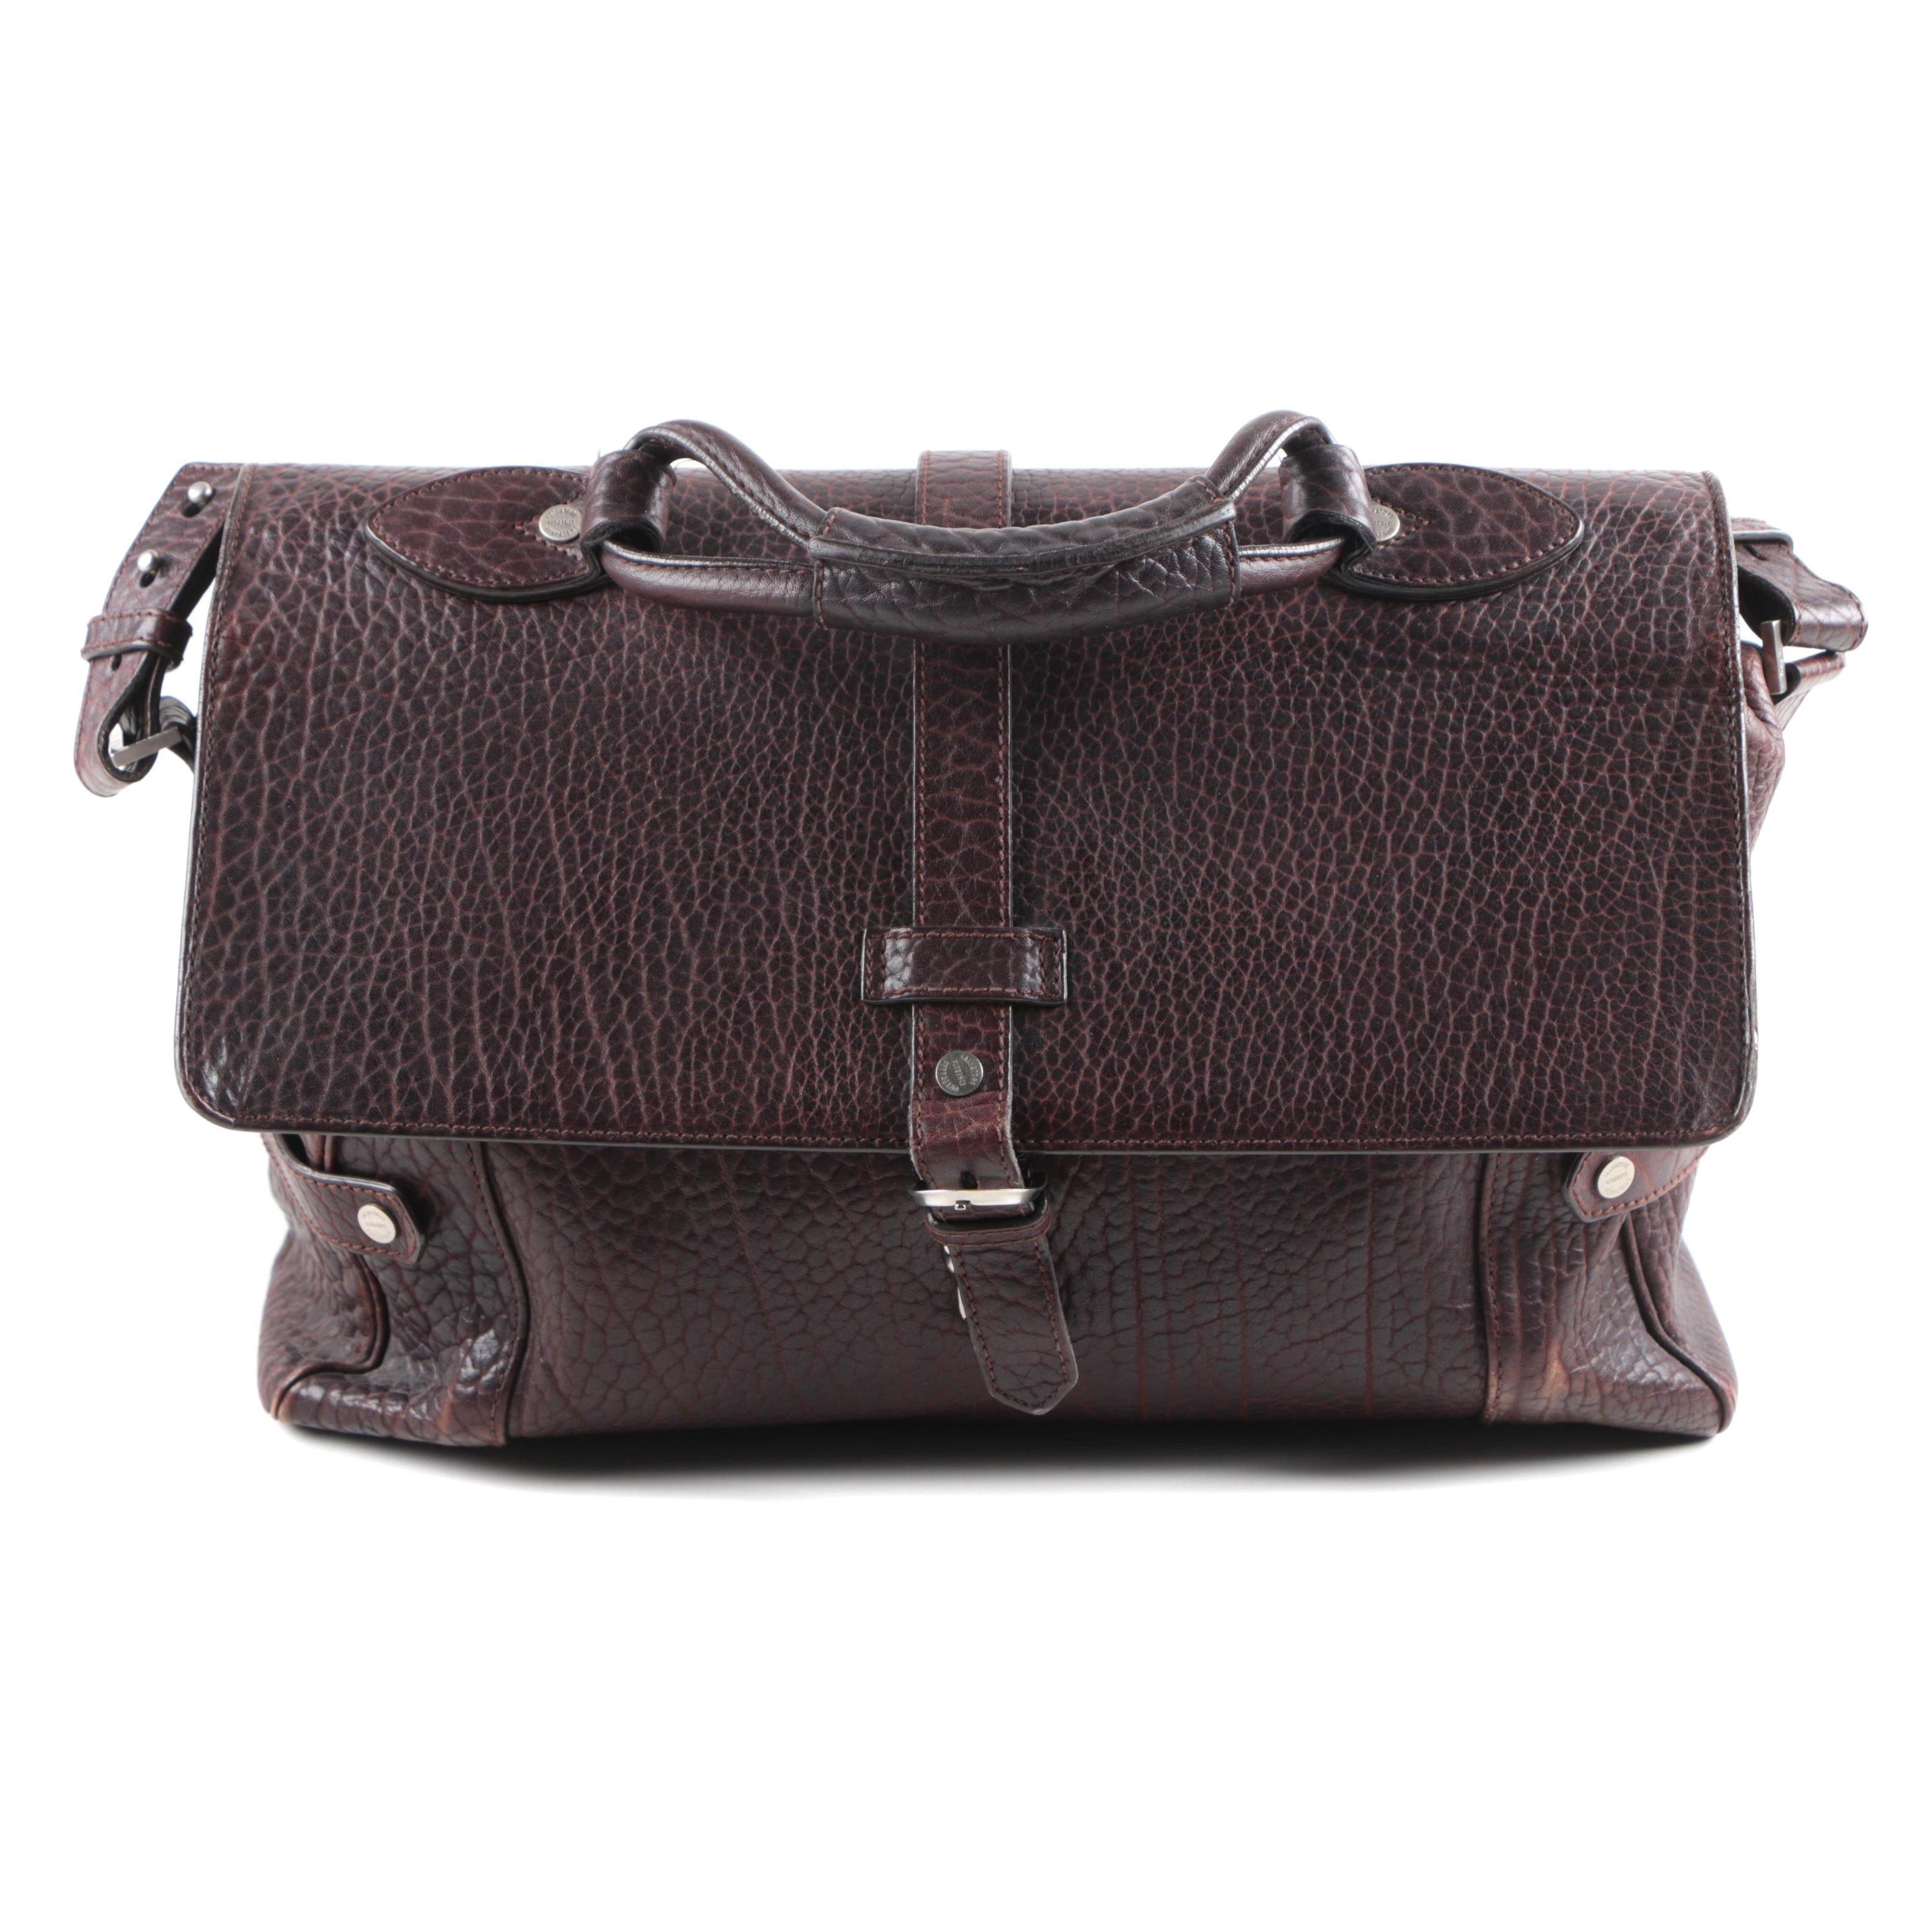 Salvatore Ferragamo Brown Leather Satchel